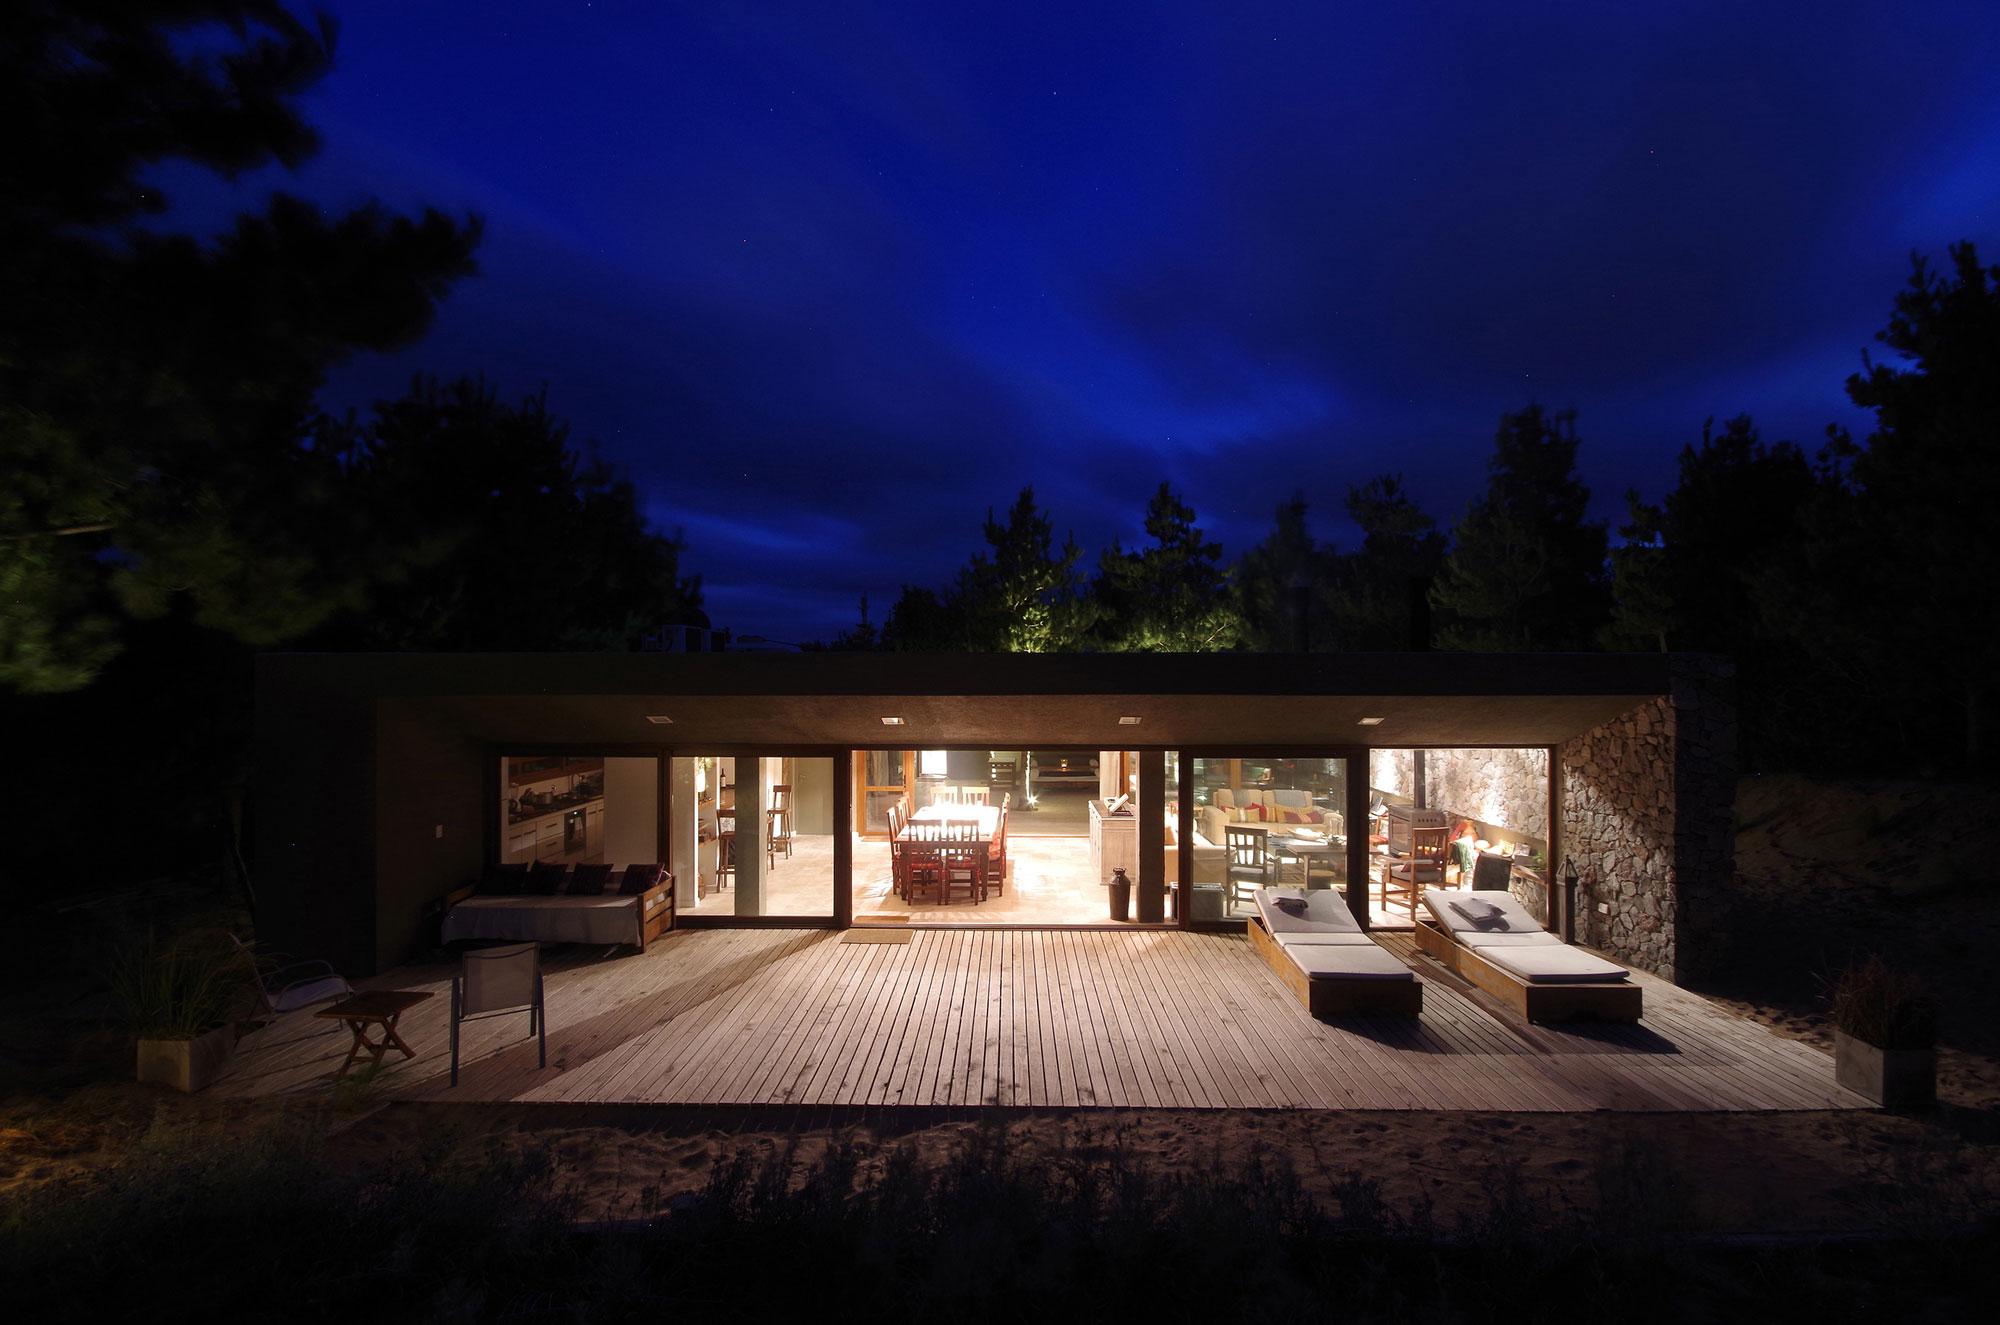 El Patio Courtyard House by night